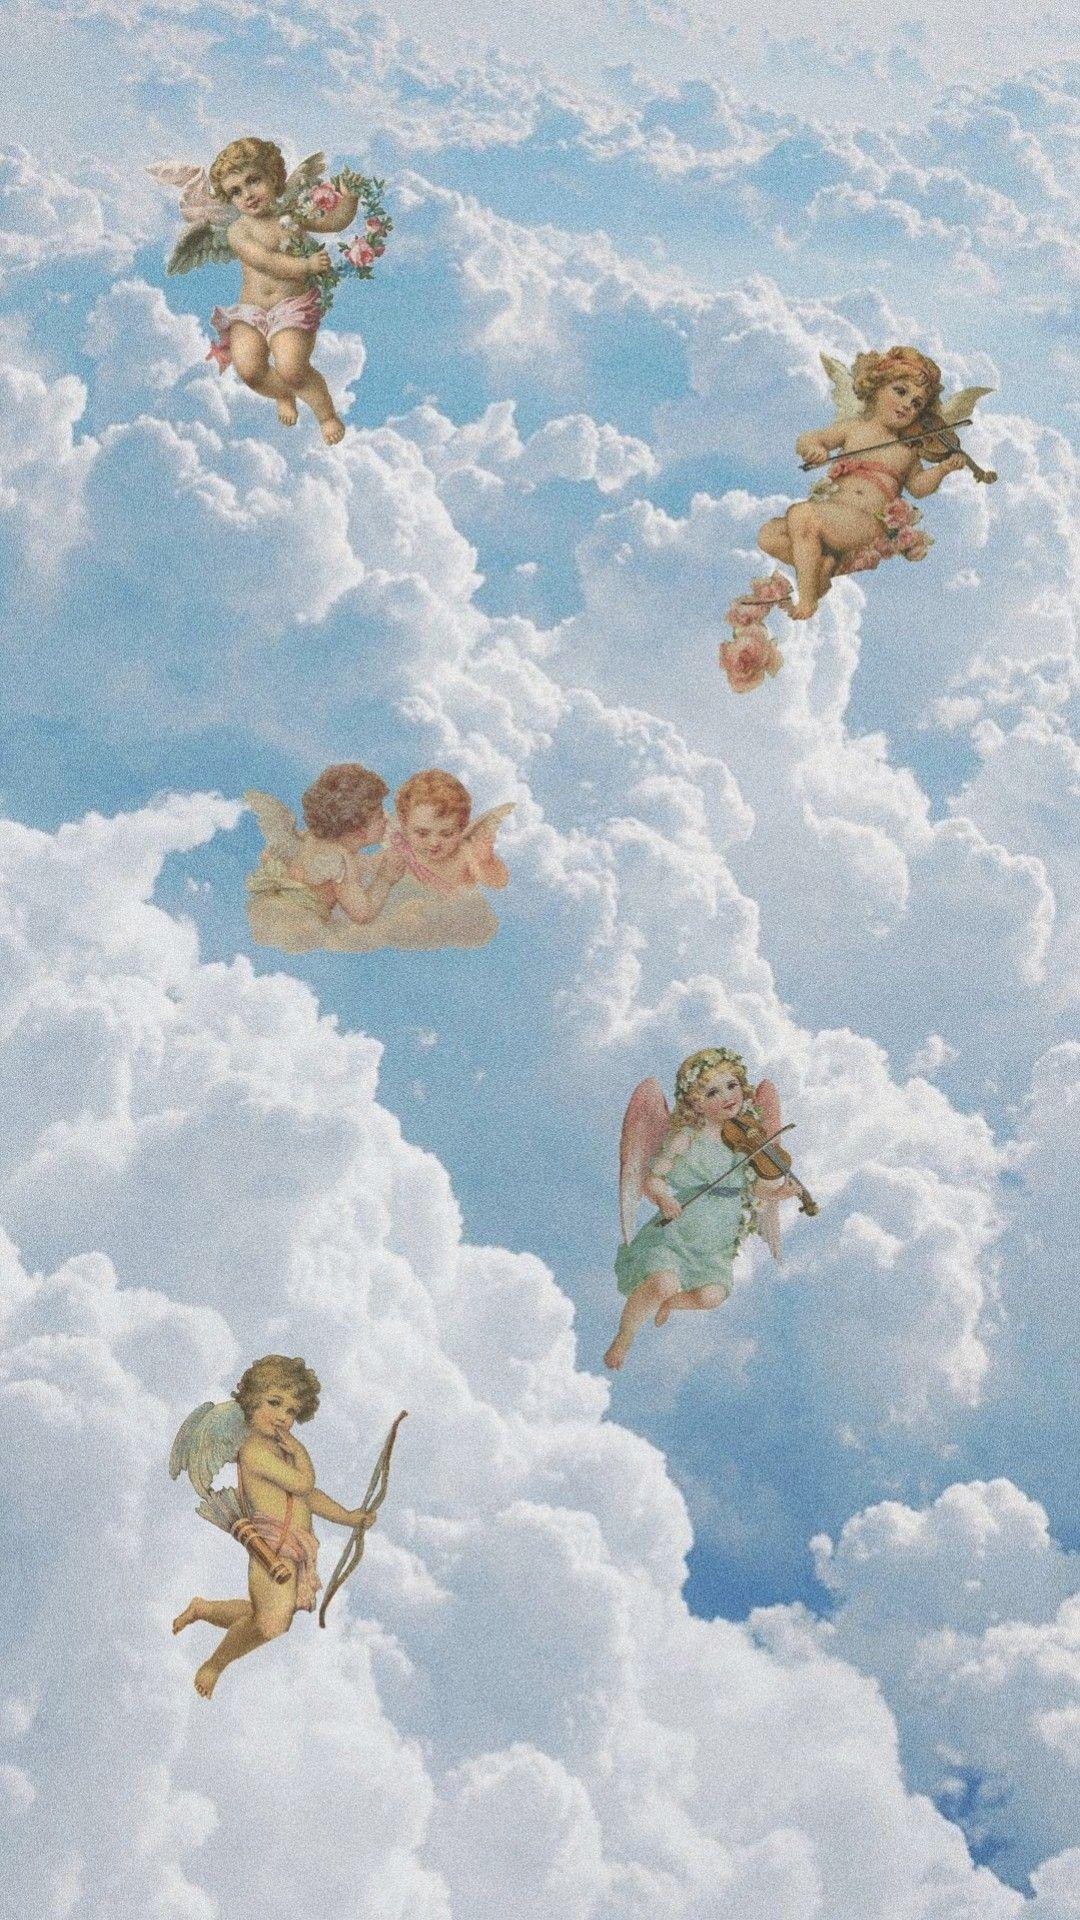 Angels Aesthetic Clouds Sky Blue Wallpaper In 2019 Angel